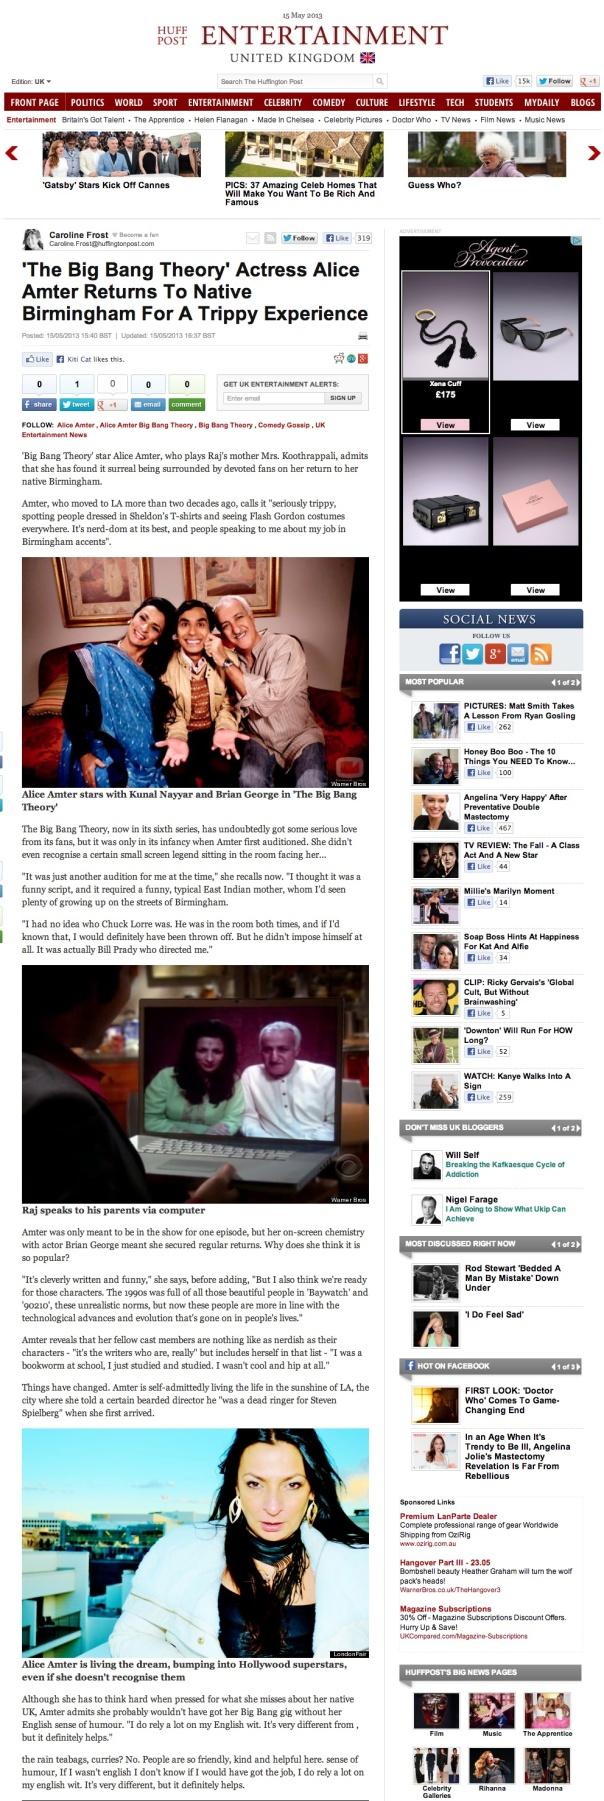 AA- The Huffington Post May 13